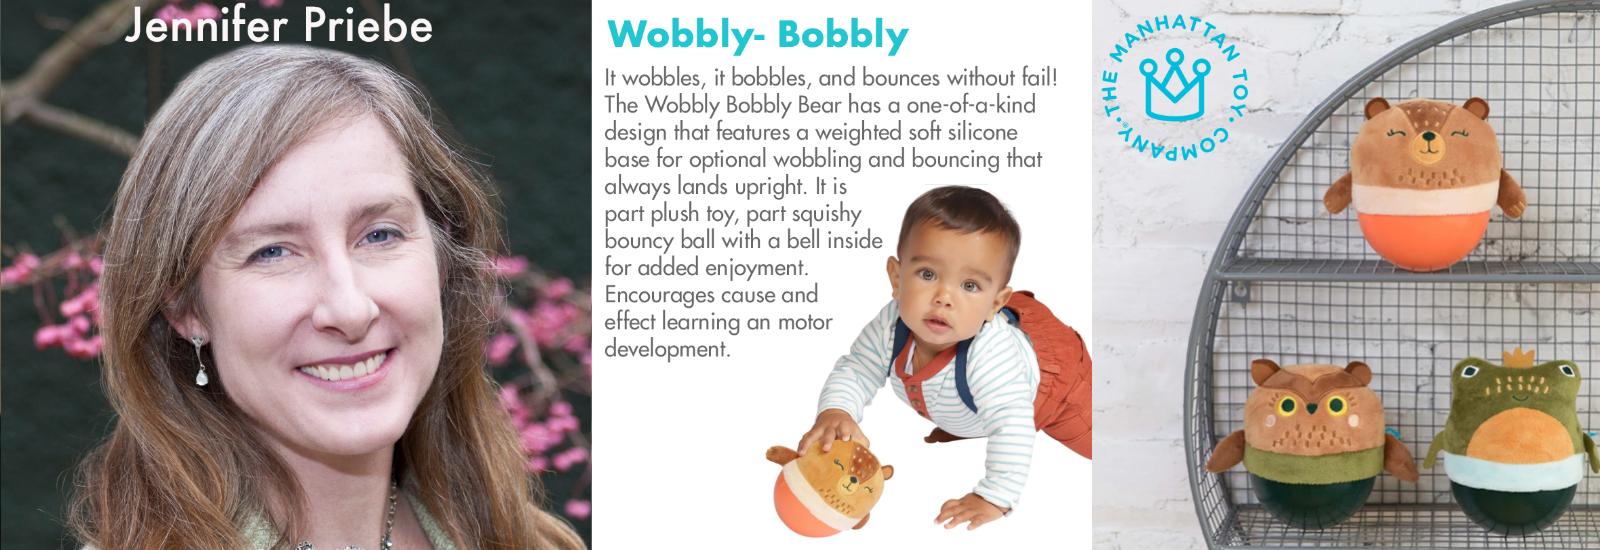 dibzy-banner_jeff_wobbly_bobbly